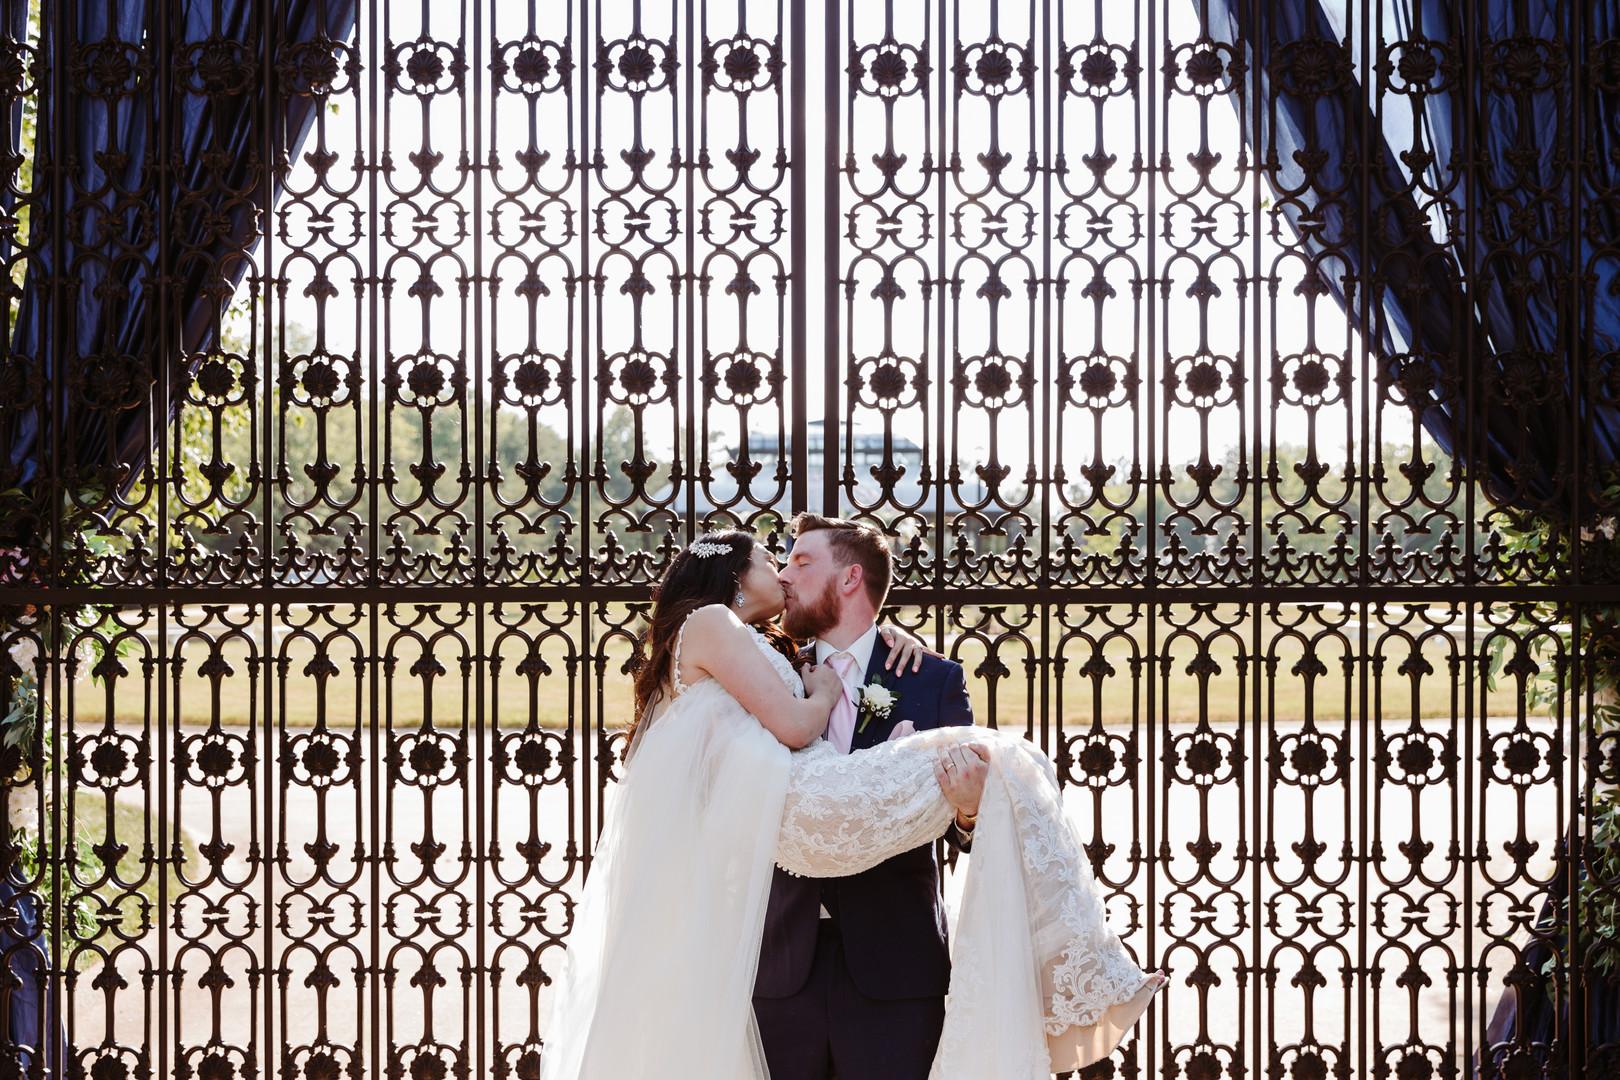 A Romantic Wedding Ceremony in the Woods – Alex & Nicole